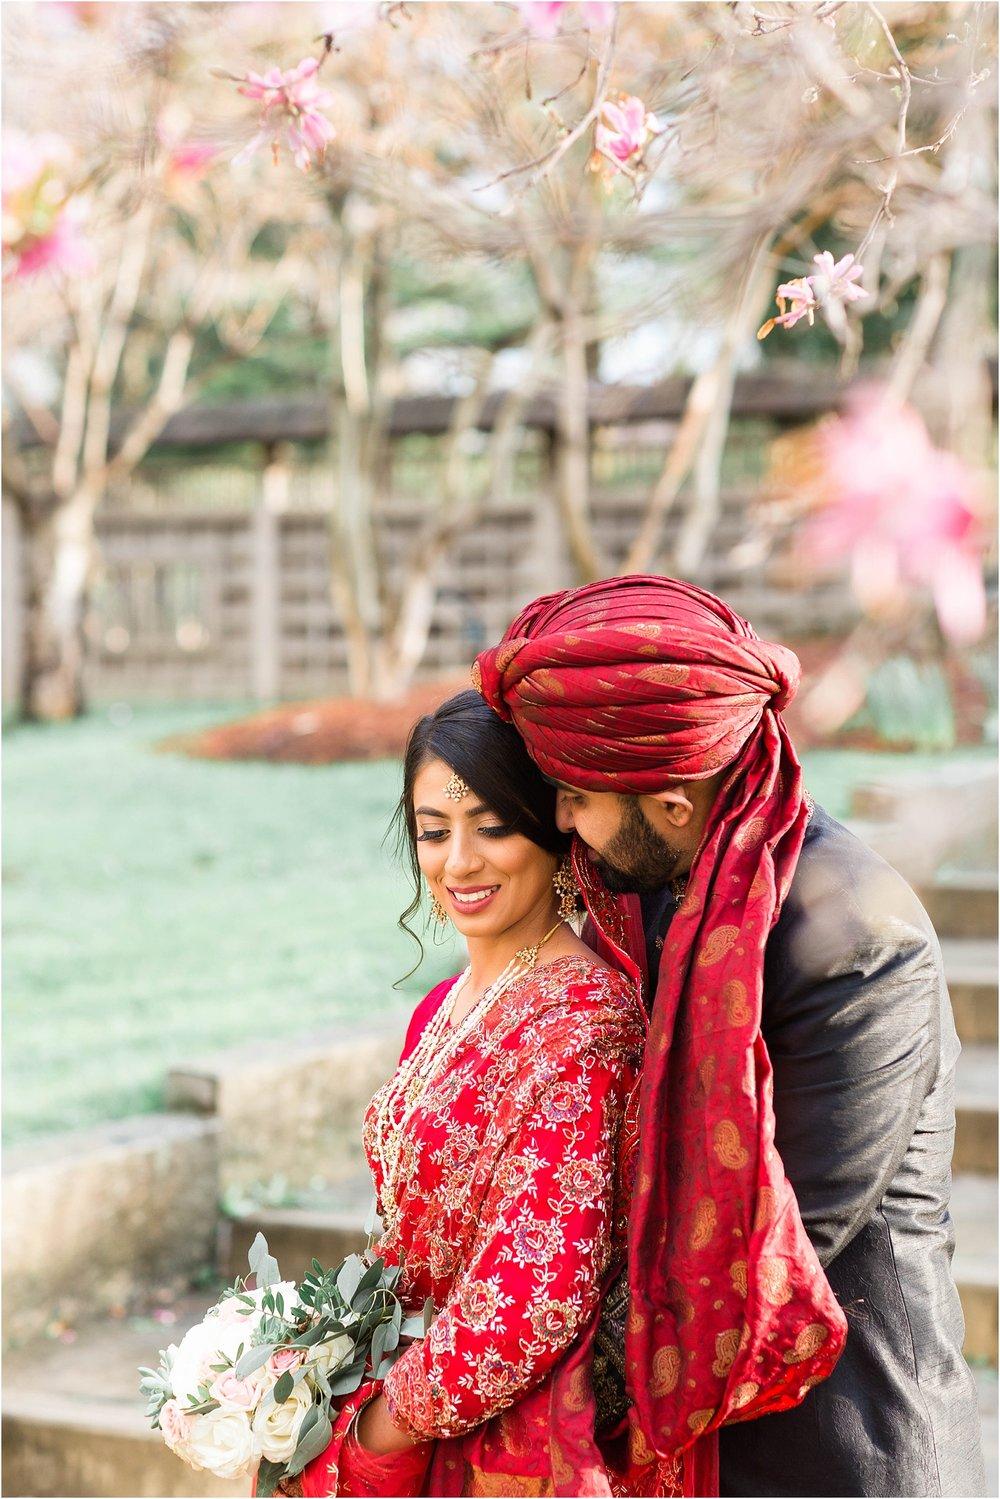 Jame-Masjid-Coopers-Mosque-Kariya-Park-Cherry-Blossoms-Wedding-Toronto-Mississauga-Brampton-Scarborough-GTA-Pakistani-Indian-Wedding-Engagement-Photographer-Photography_0064.jpg